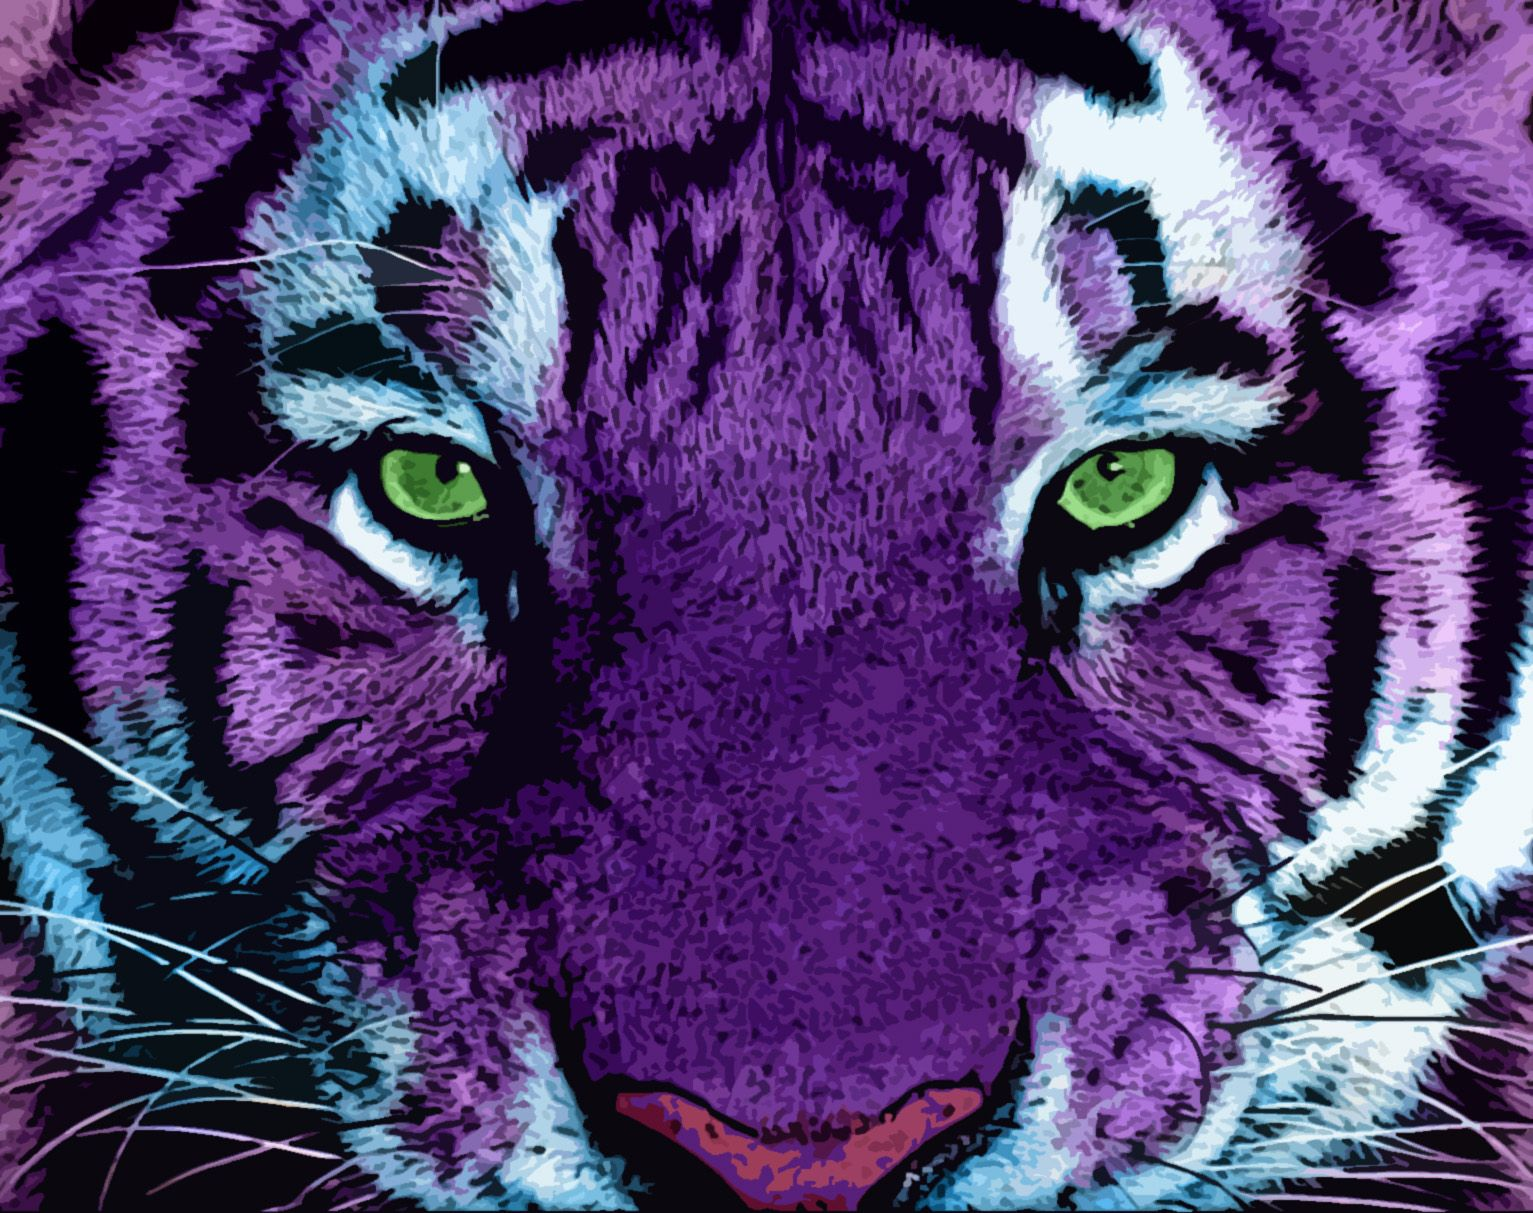 Google Image Result for http://www.deviantart.com/download/191791406/purple_tiger_by_schizophrenicracoon-d366r72.jpg